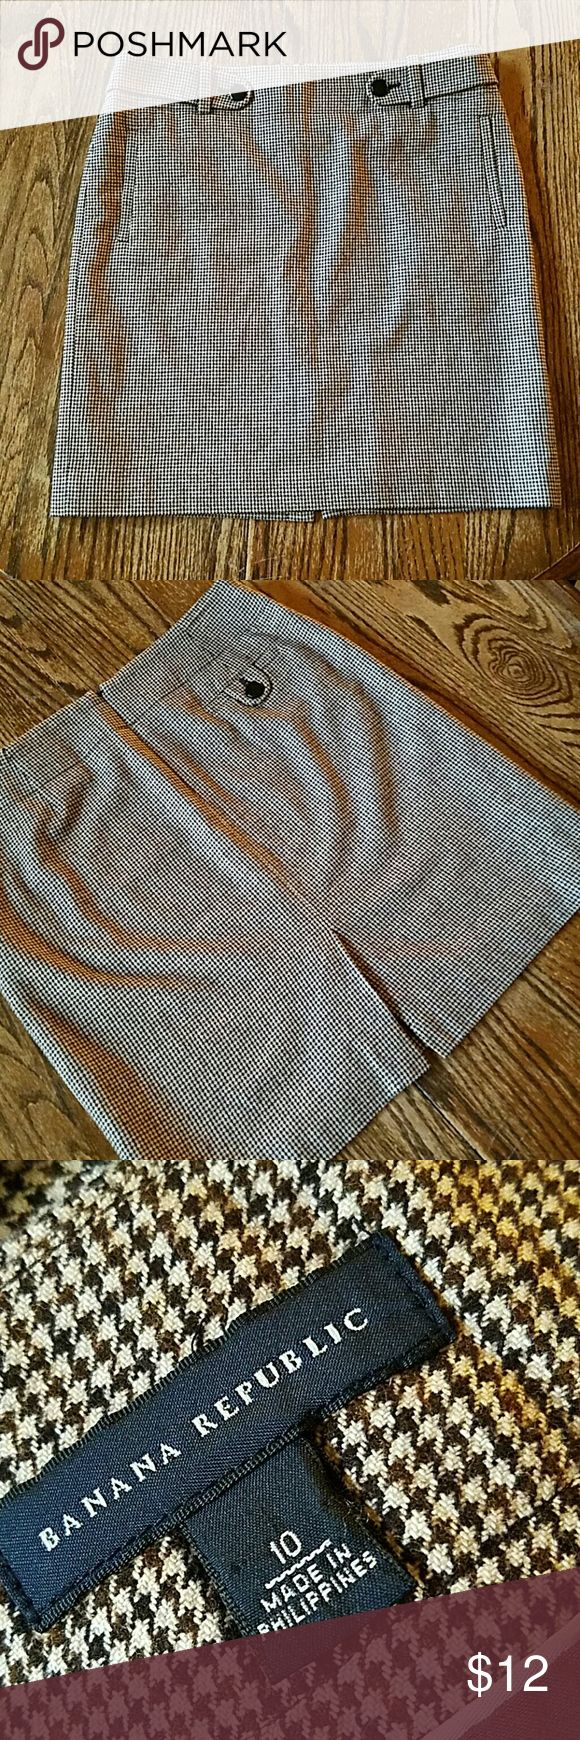 Banana Republic Skirt Classic plaid fabric with side pockets and slit. Banana Republic Skirts Midi